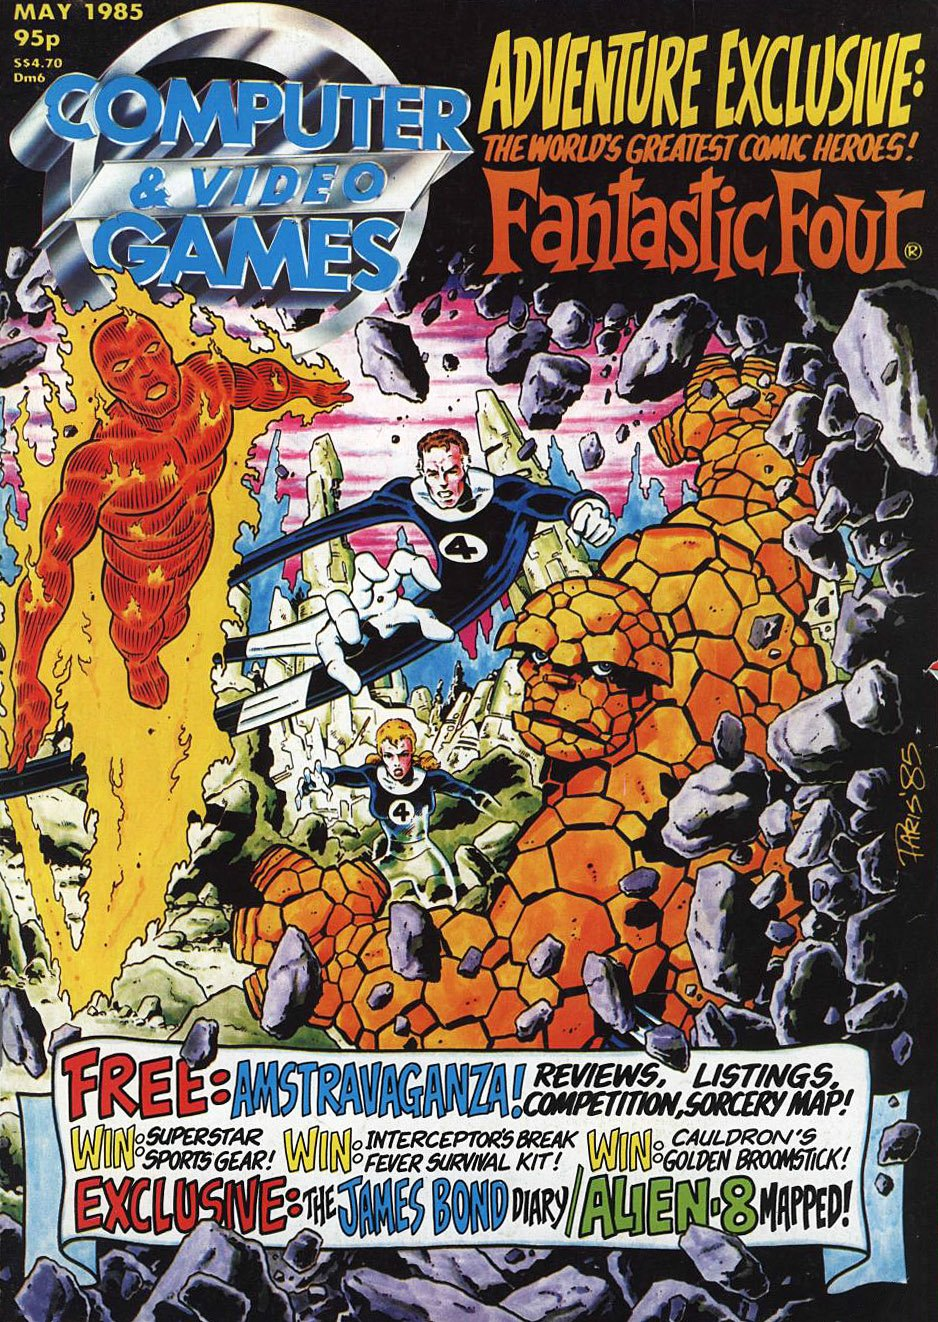 Computer & Video Games 043 (May 1985)